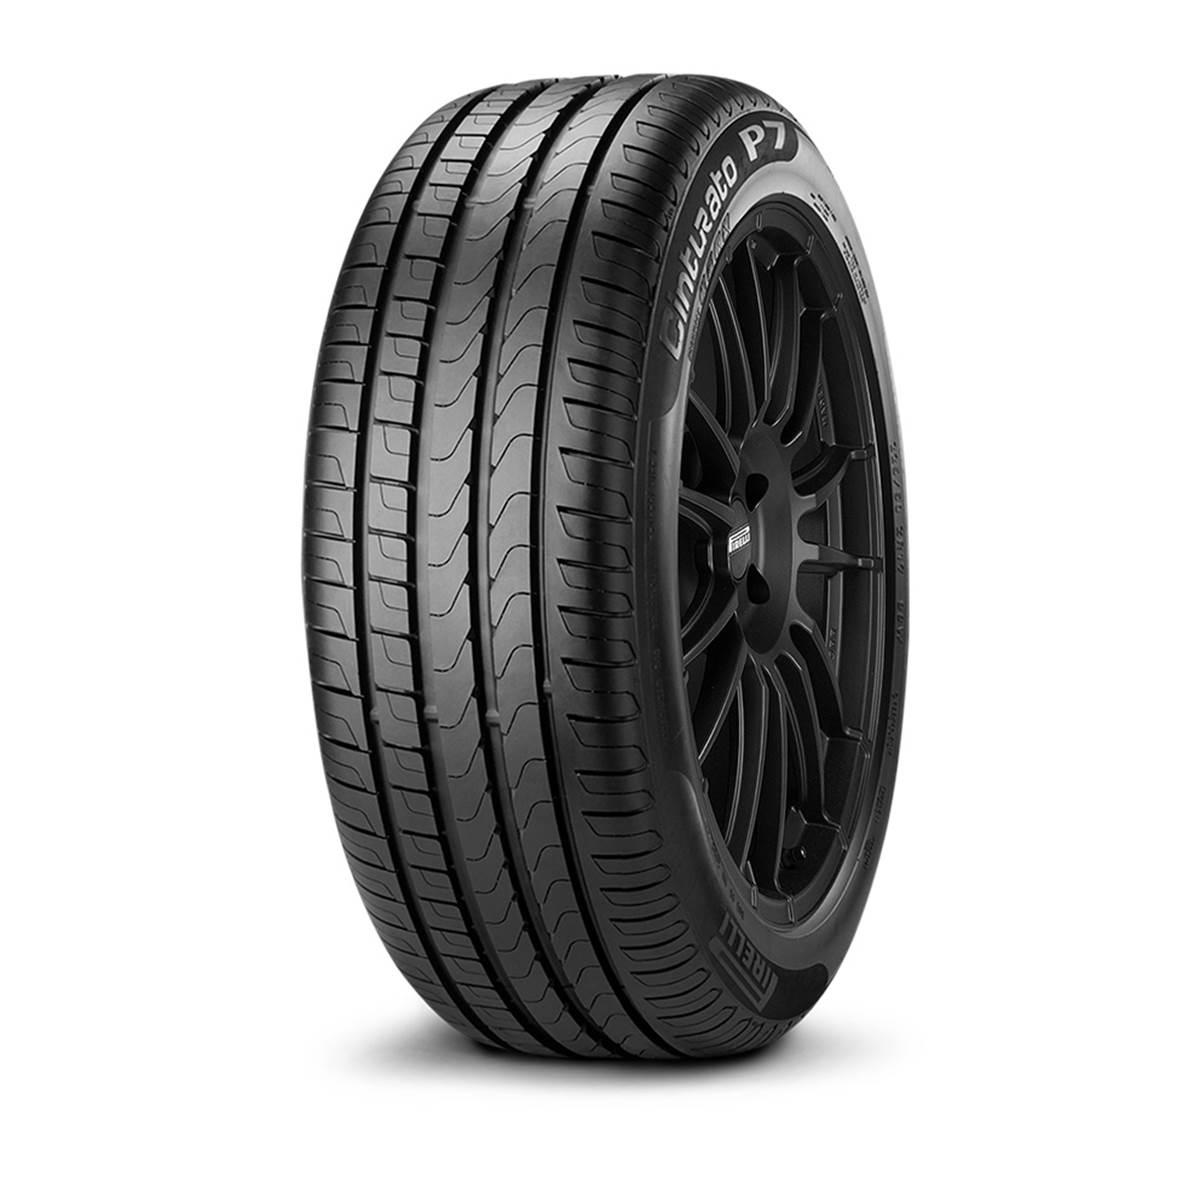 Pneu Pirelli 235/50R17 96W Cinturato P7